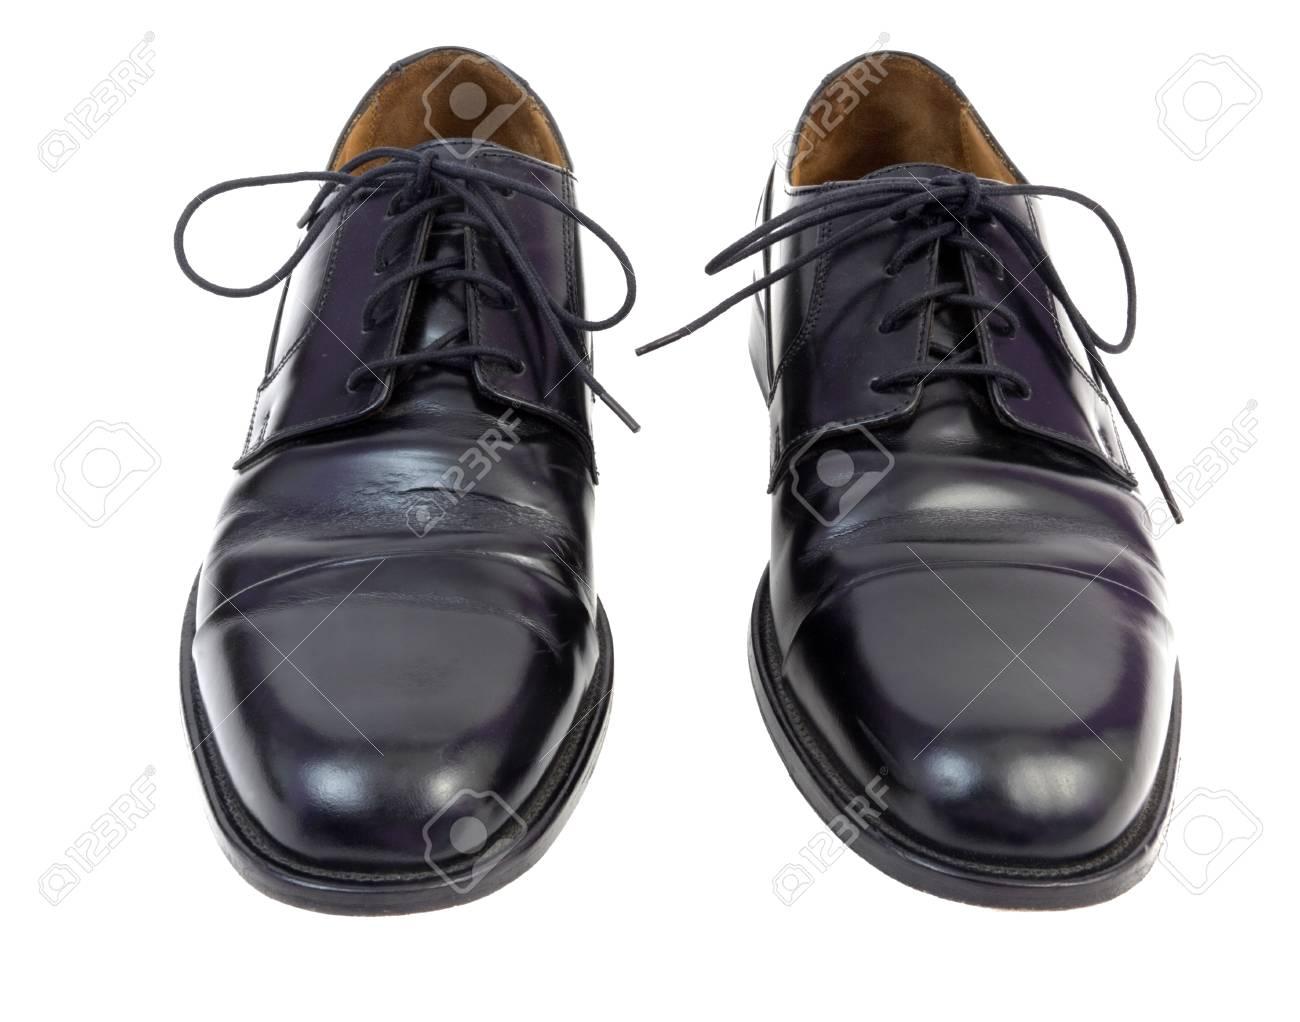 Shiny Black Men's Dress Shoes Side By